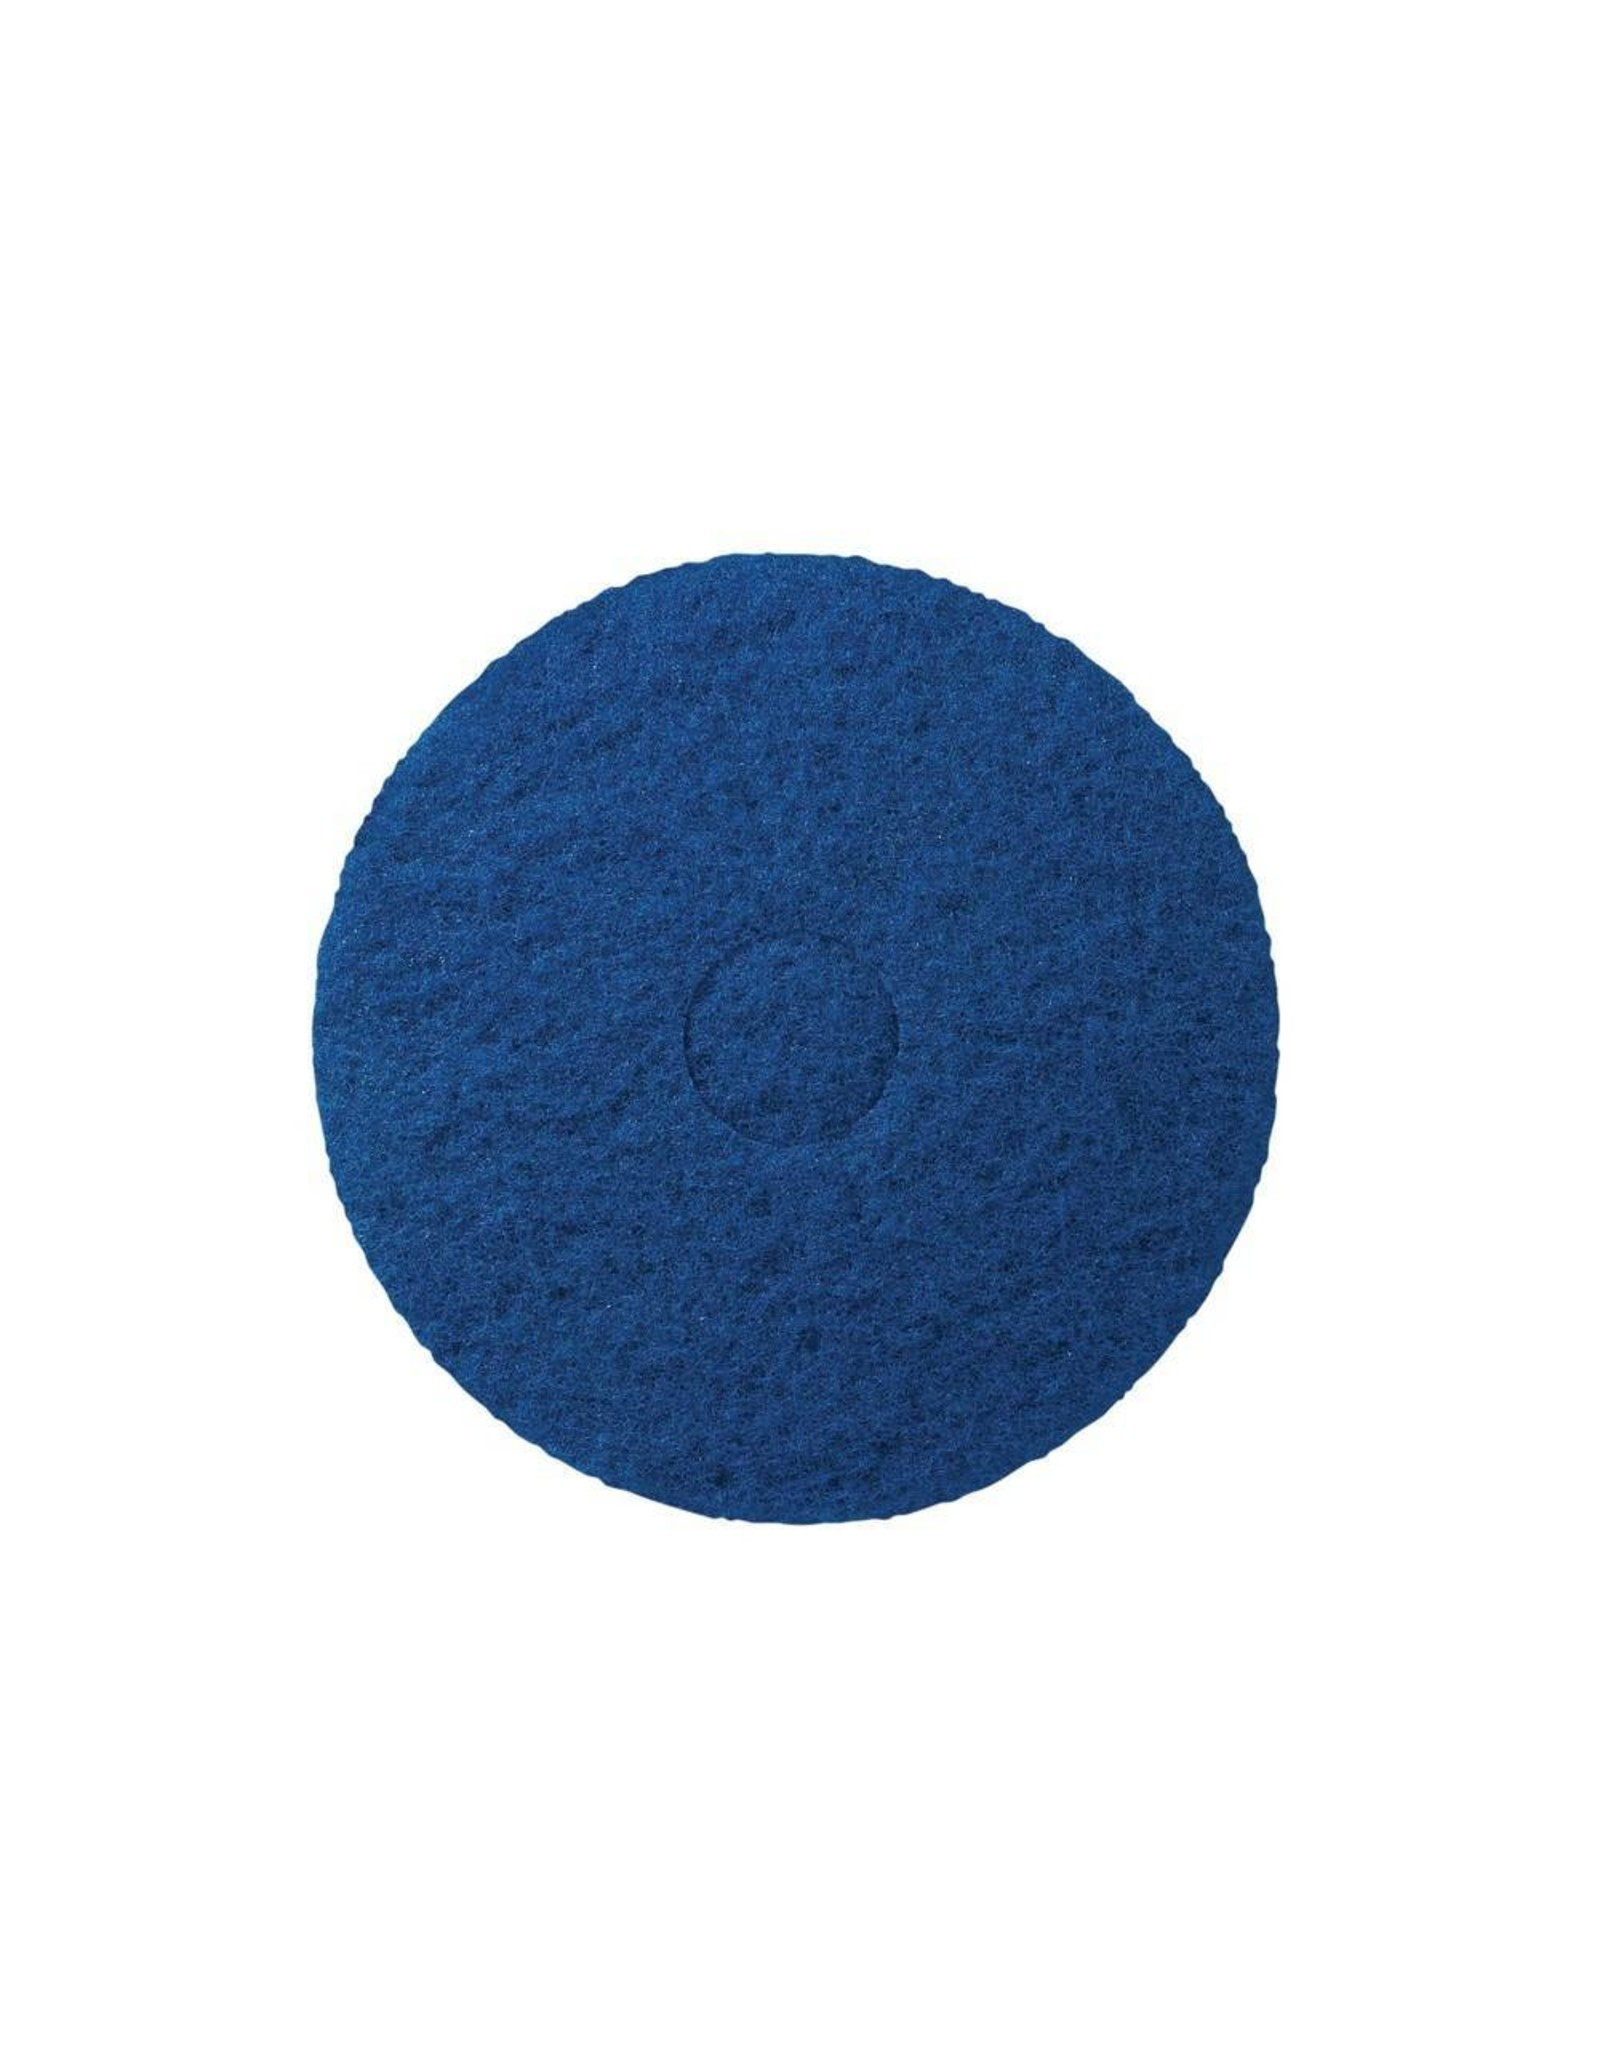 ACOR Nylon Pads Blauw - 33 CM, 2 CM, 13 inch (High Quality)